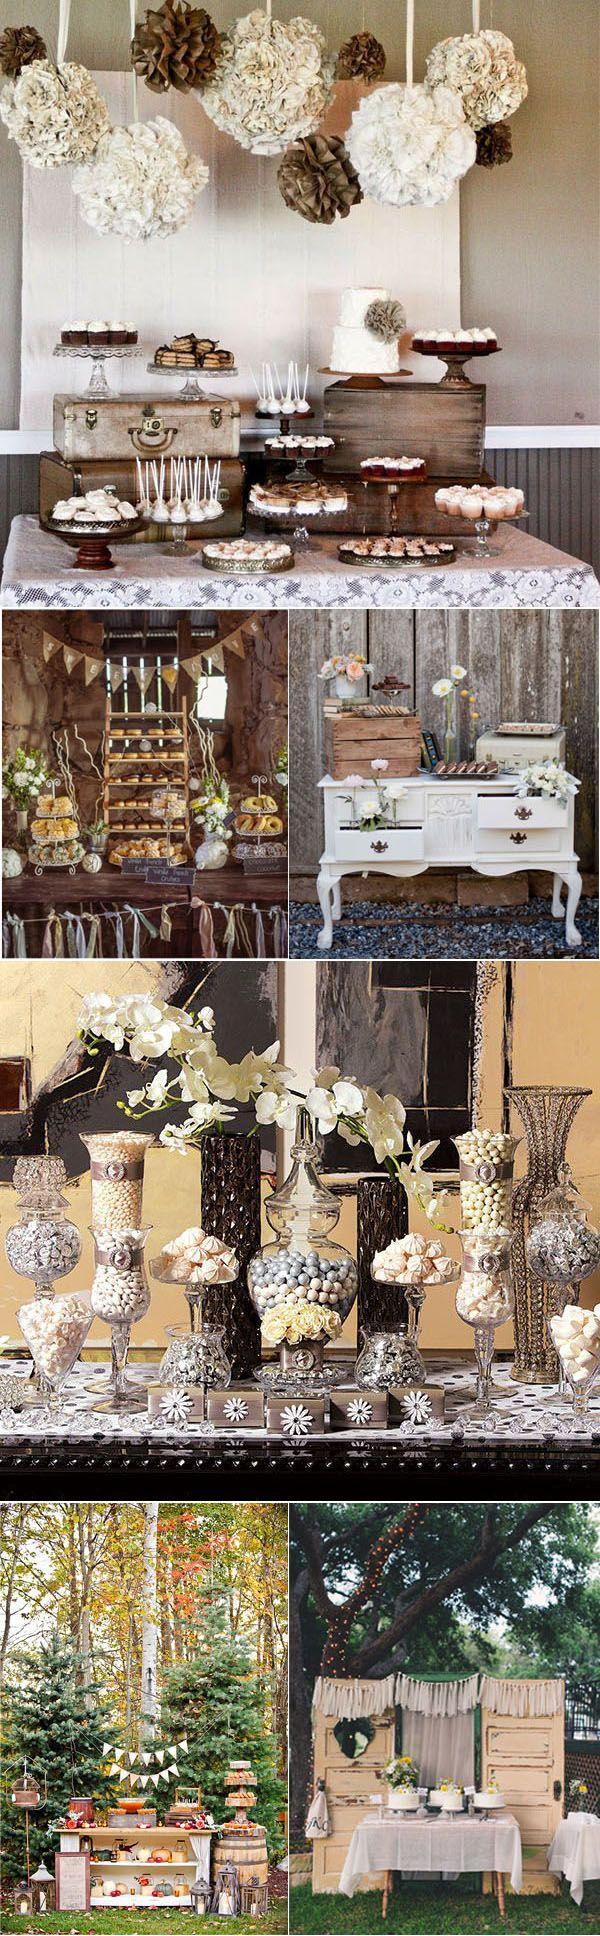 Vintage wedding scrapbook ideas - Vintage Wedding Dessert Table